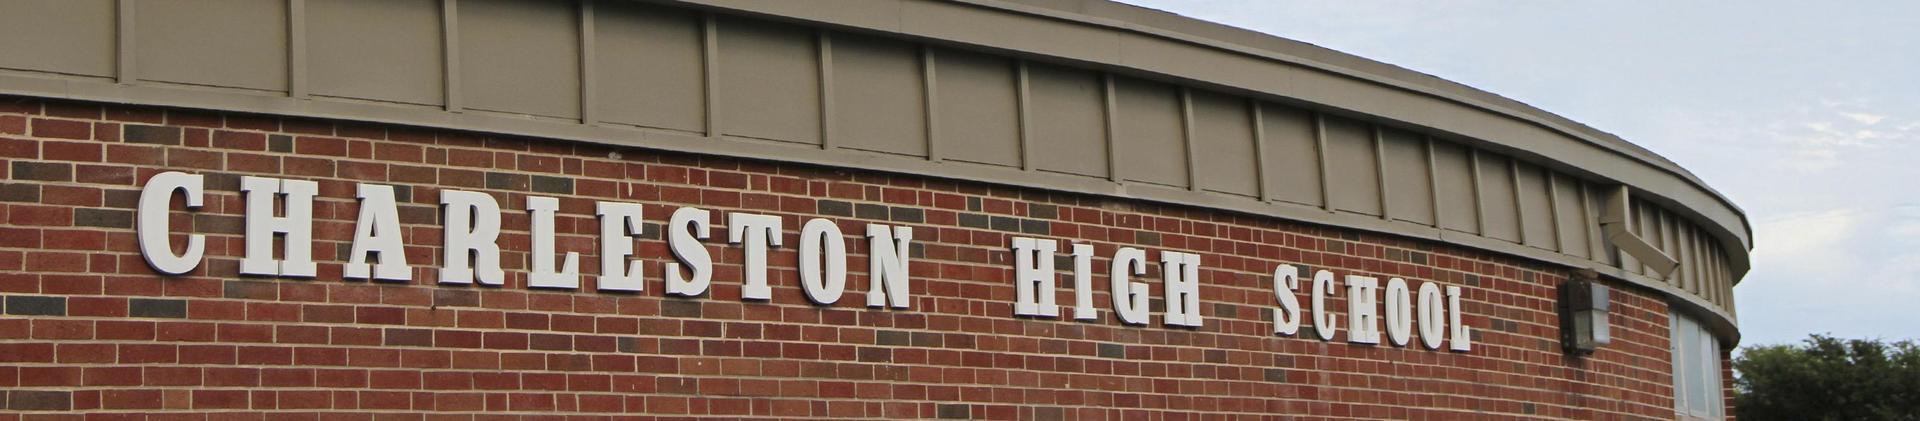 Charleston High School building